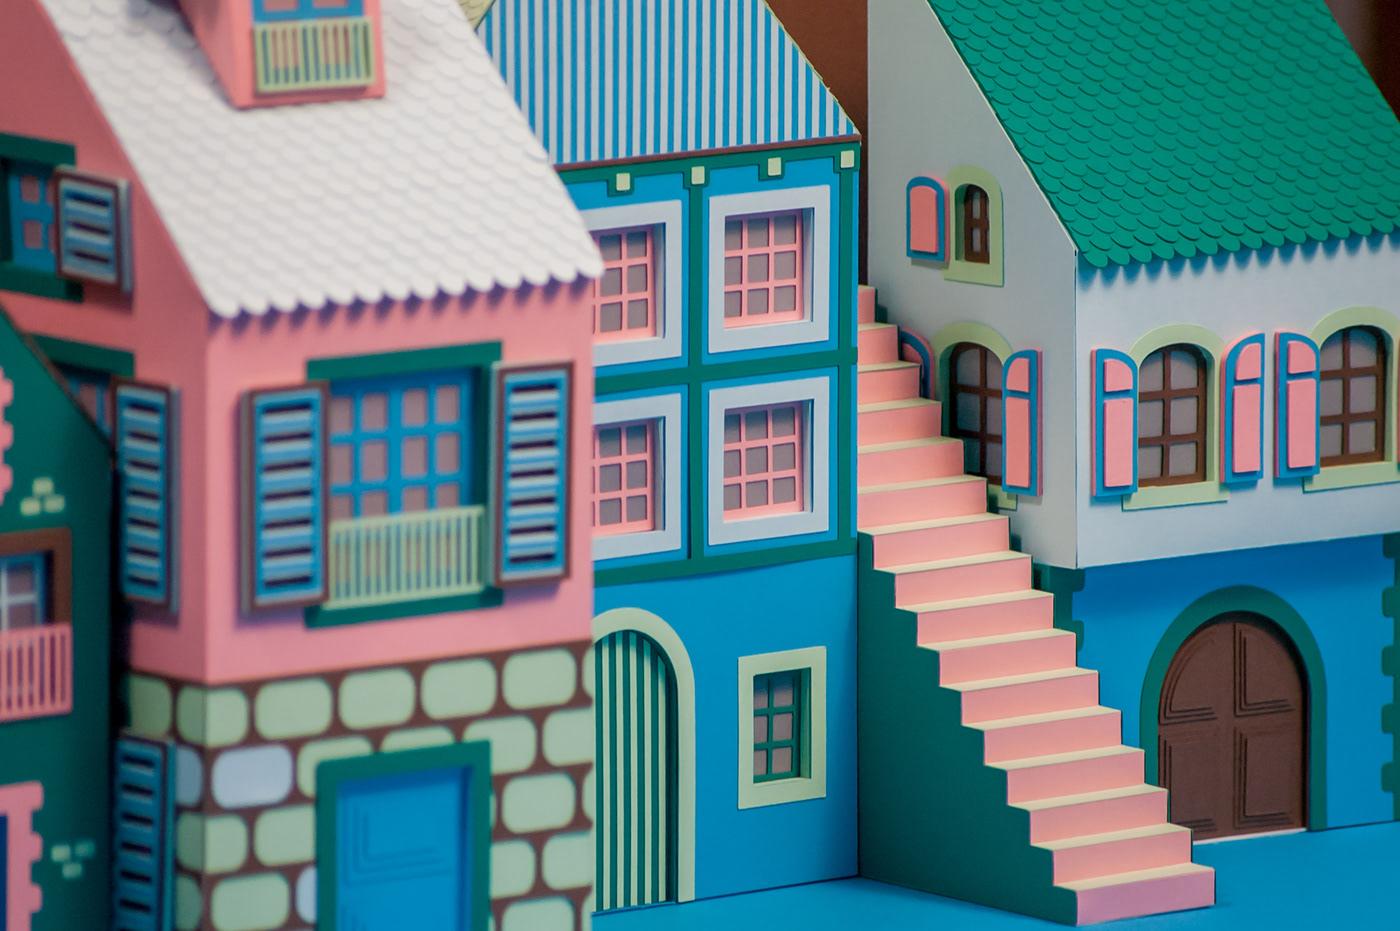 architecture city color handmade hermes paper paper art paper craft paper design windows display